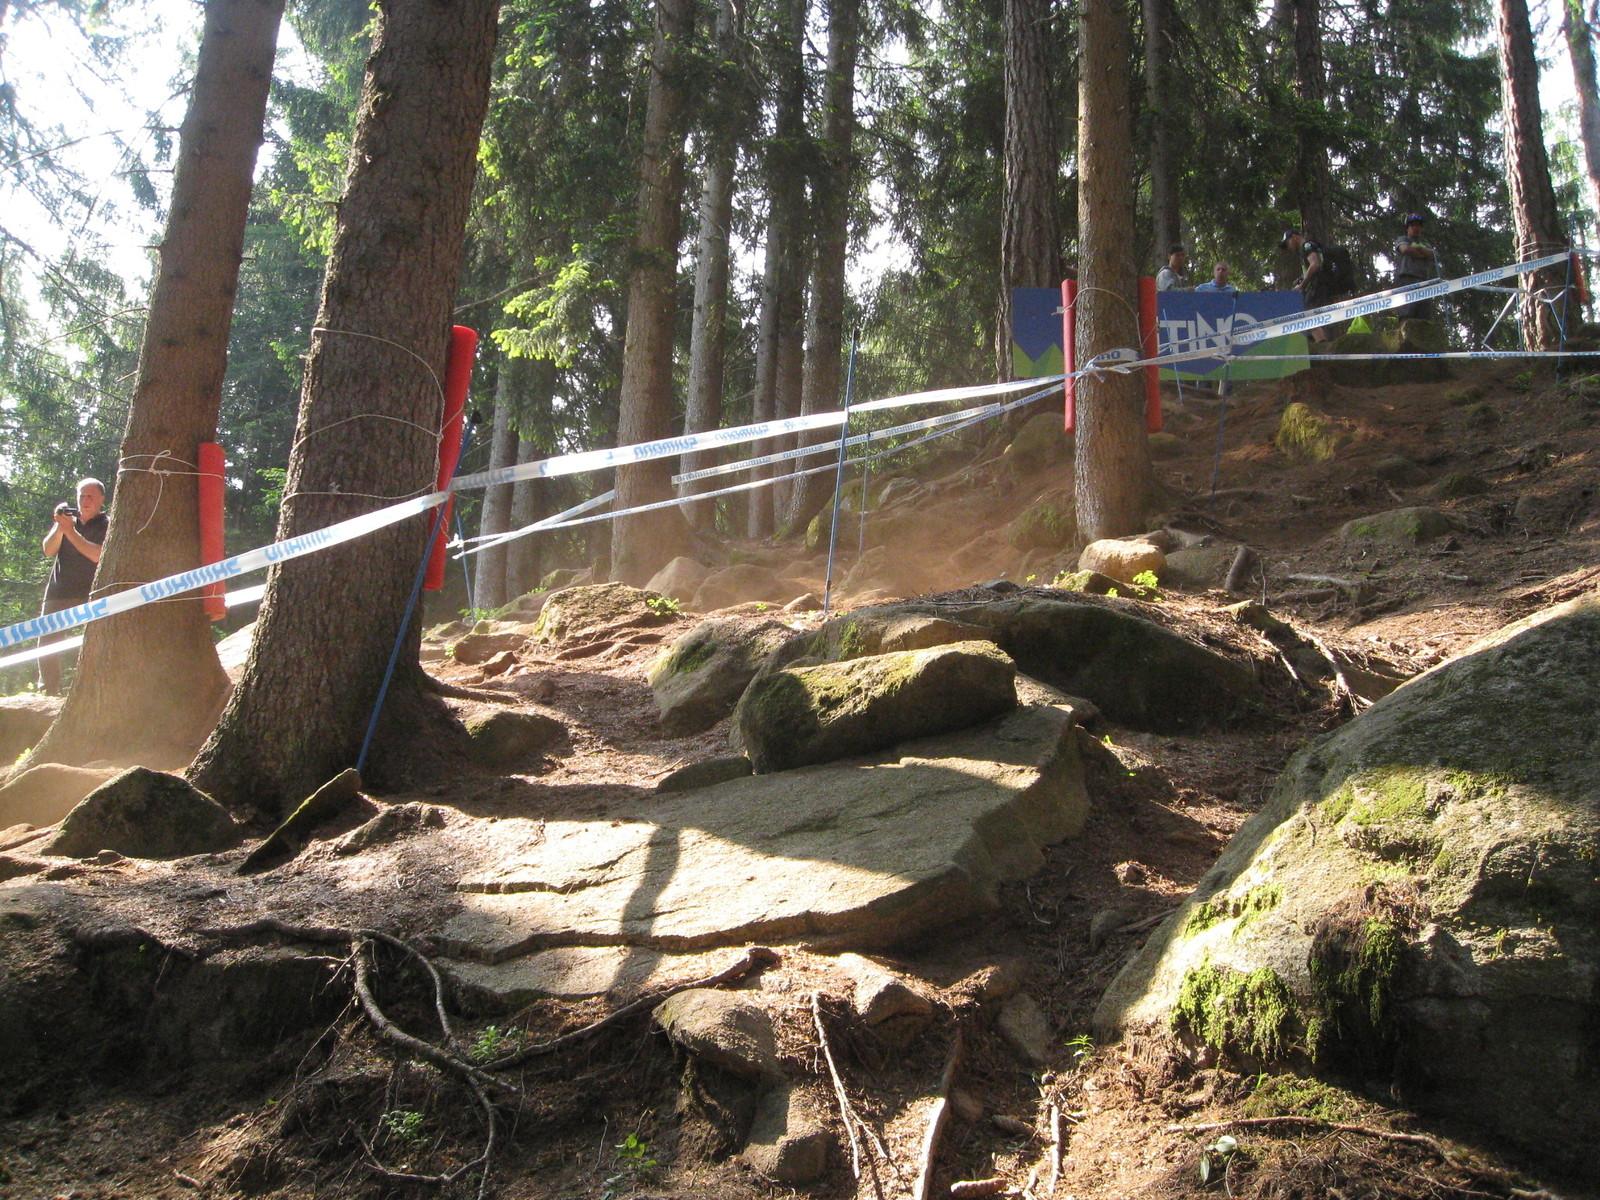 Upper section gnar - onenerdykid* - Mountain Biking Pictures - Vital MTB